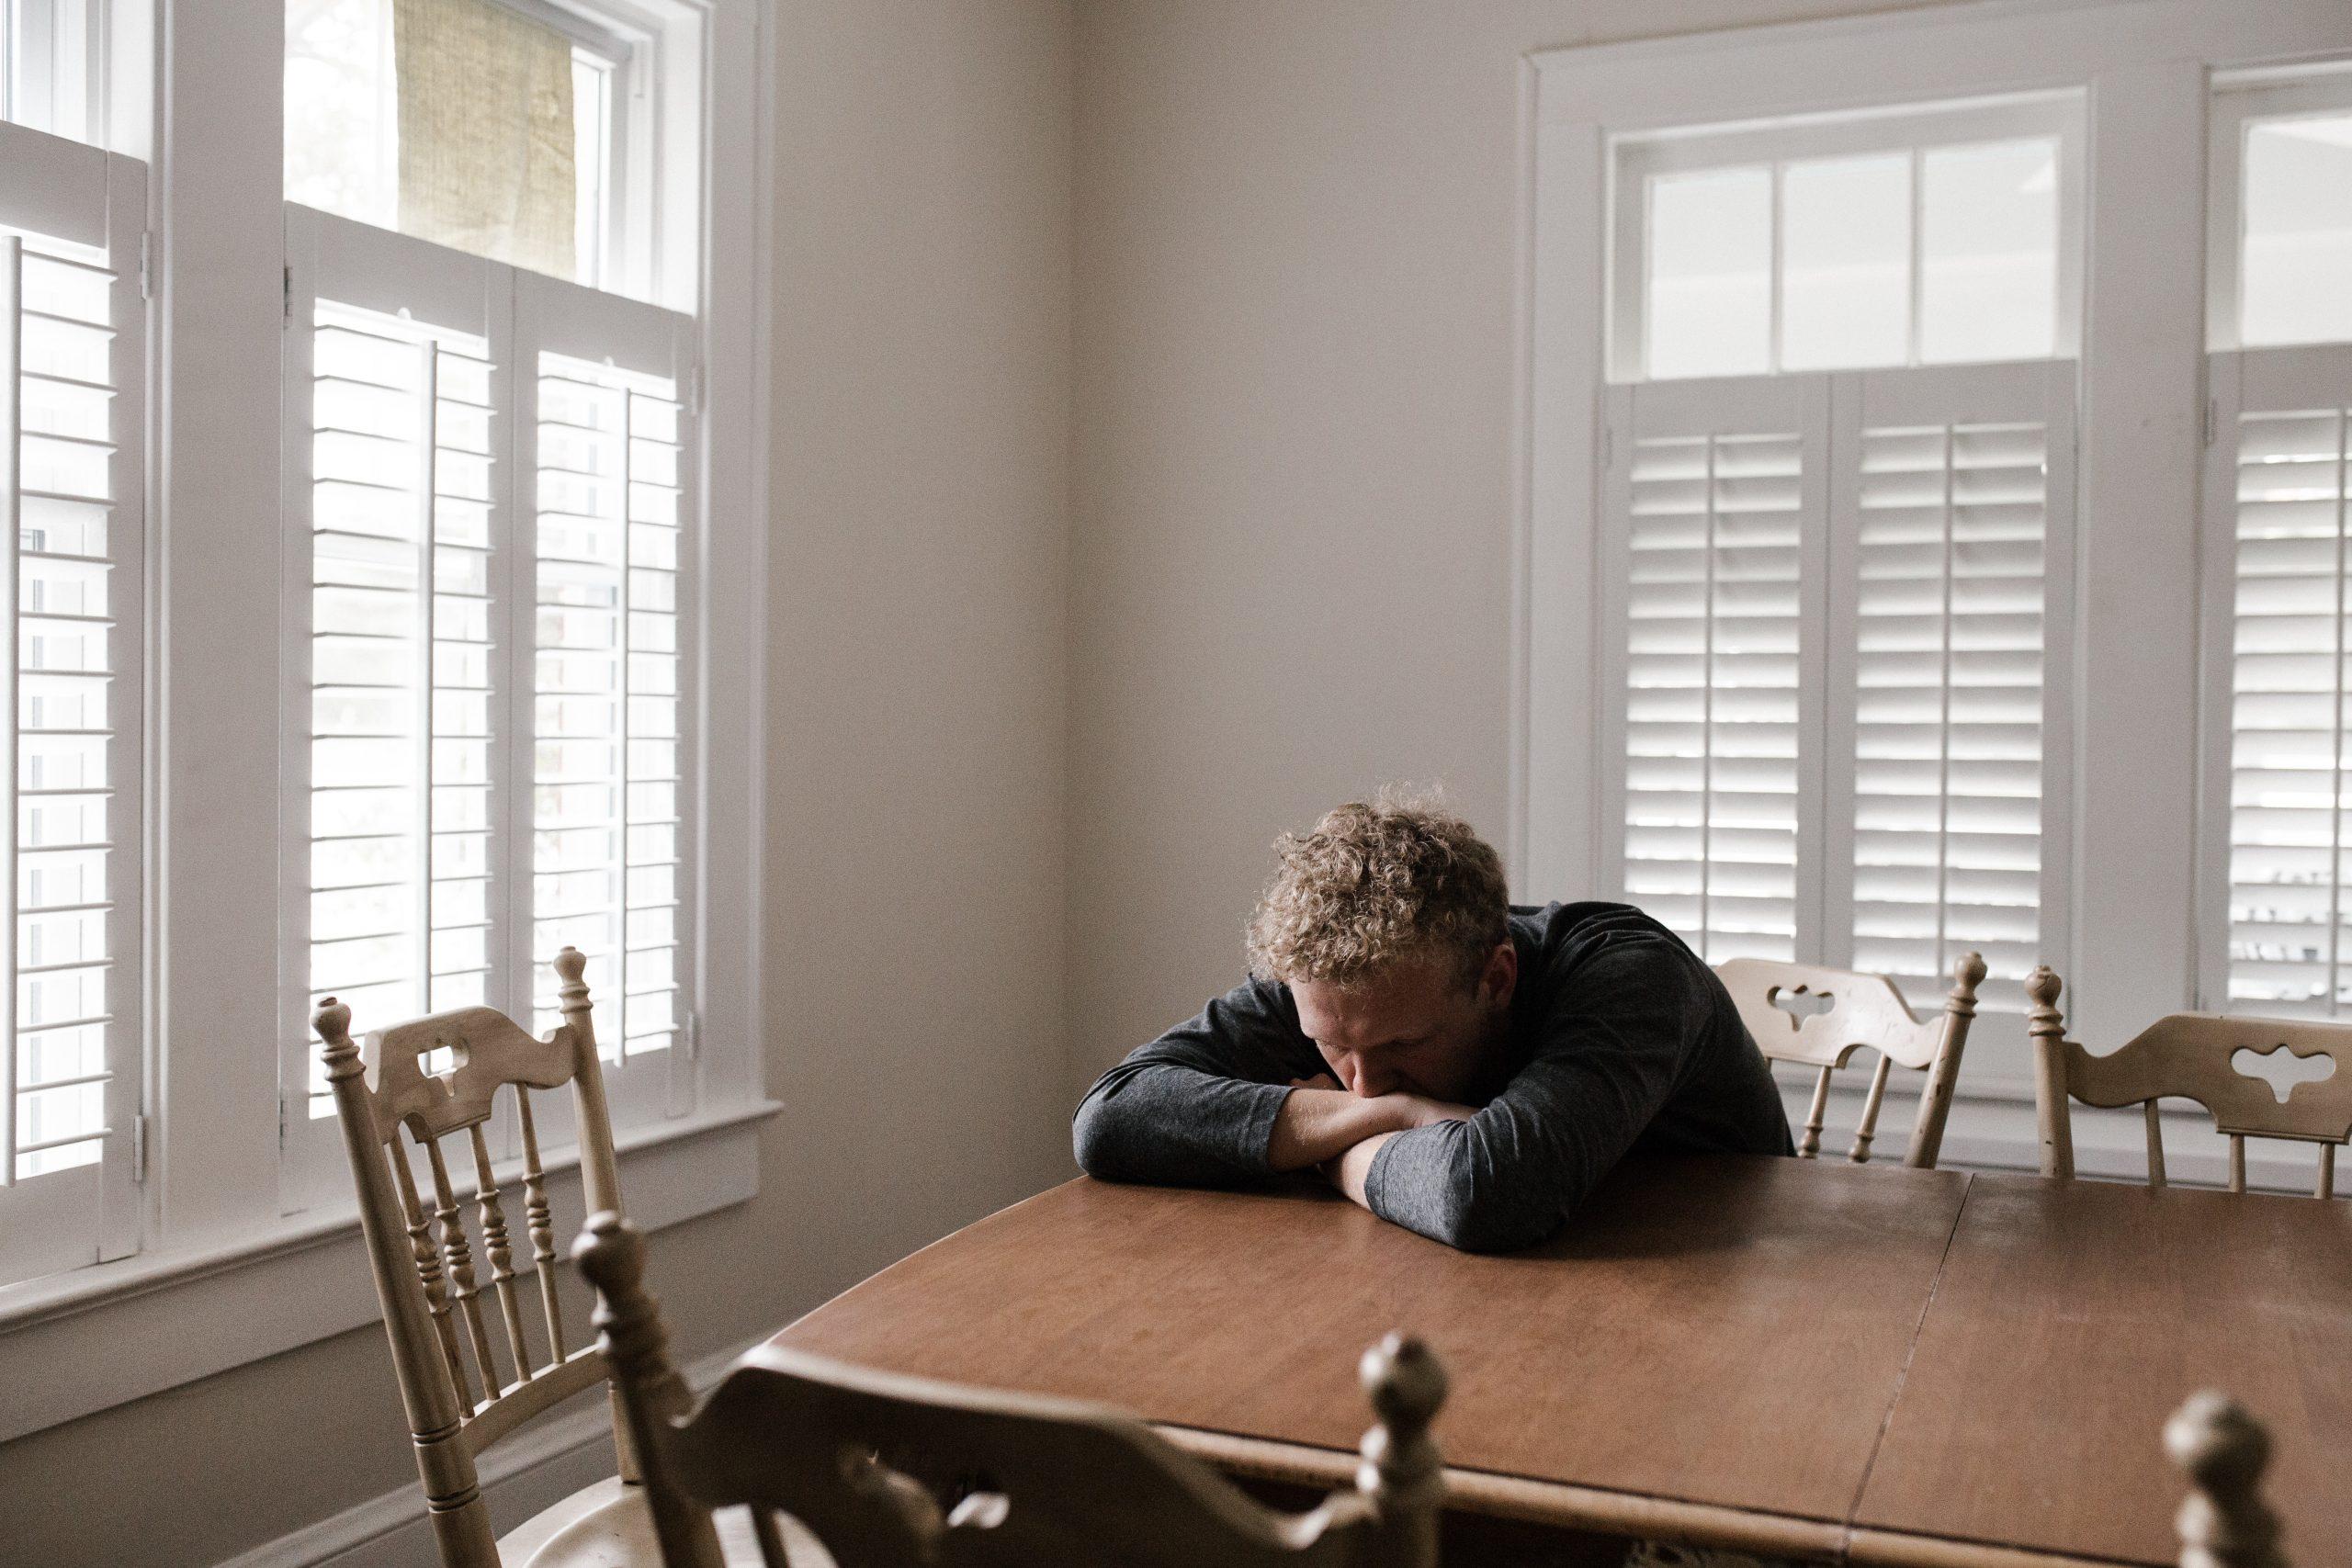 Clinical Depression Vs Depressive state